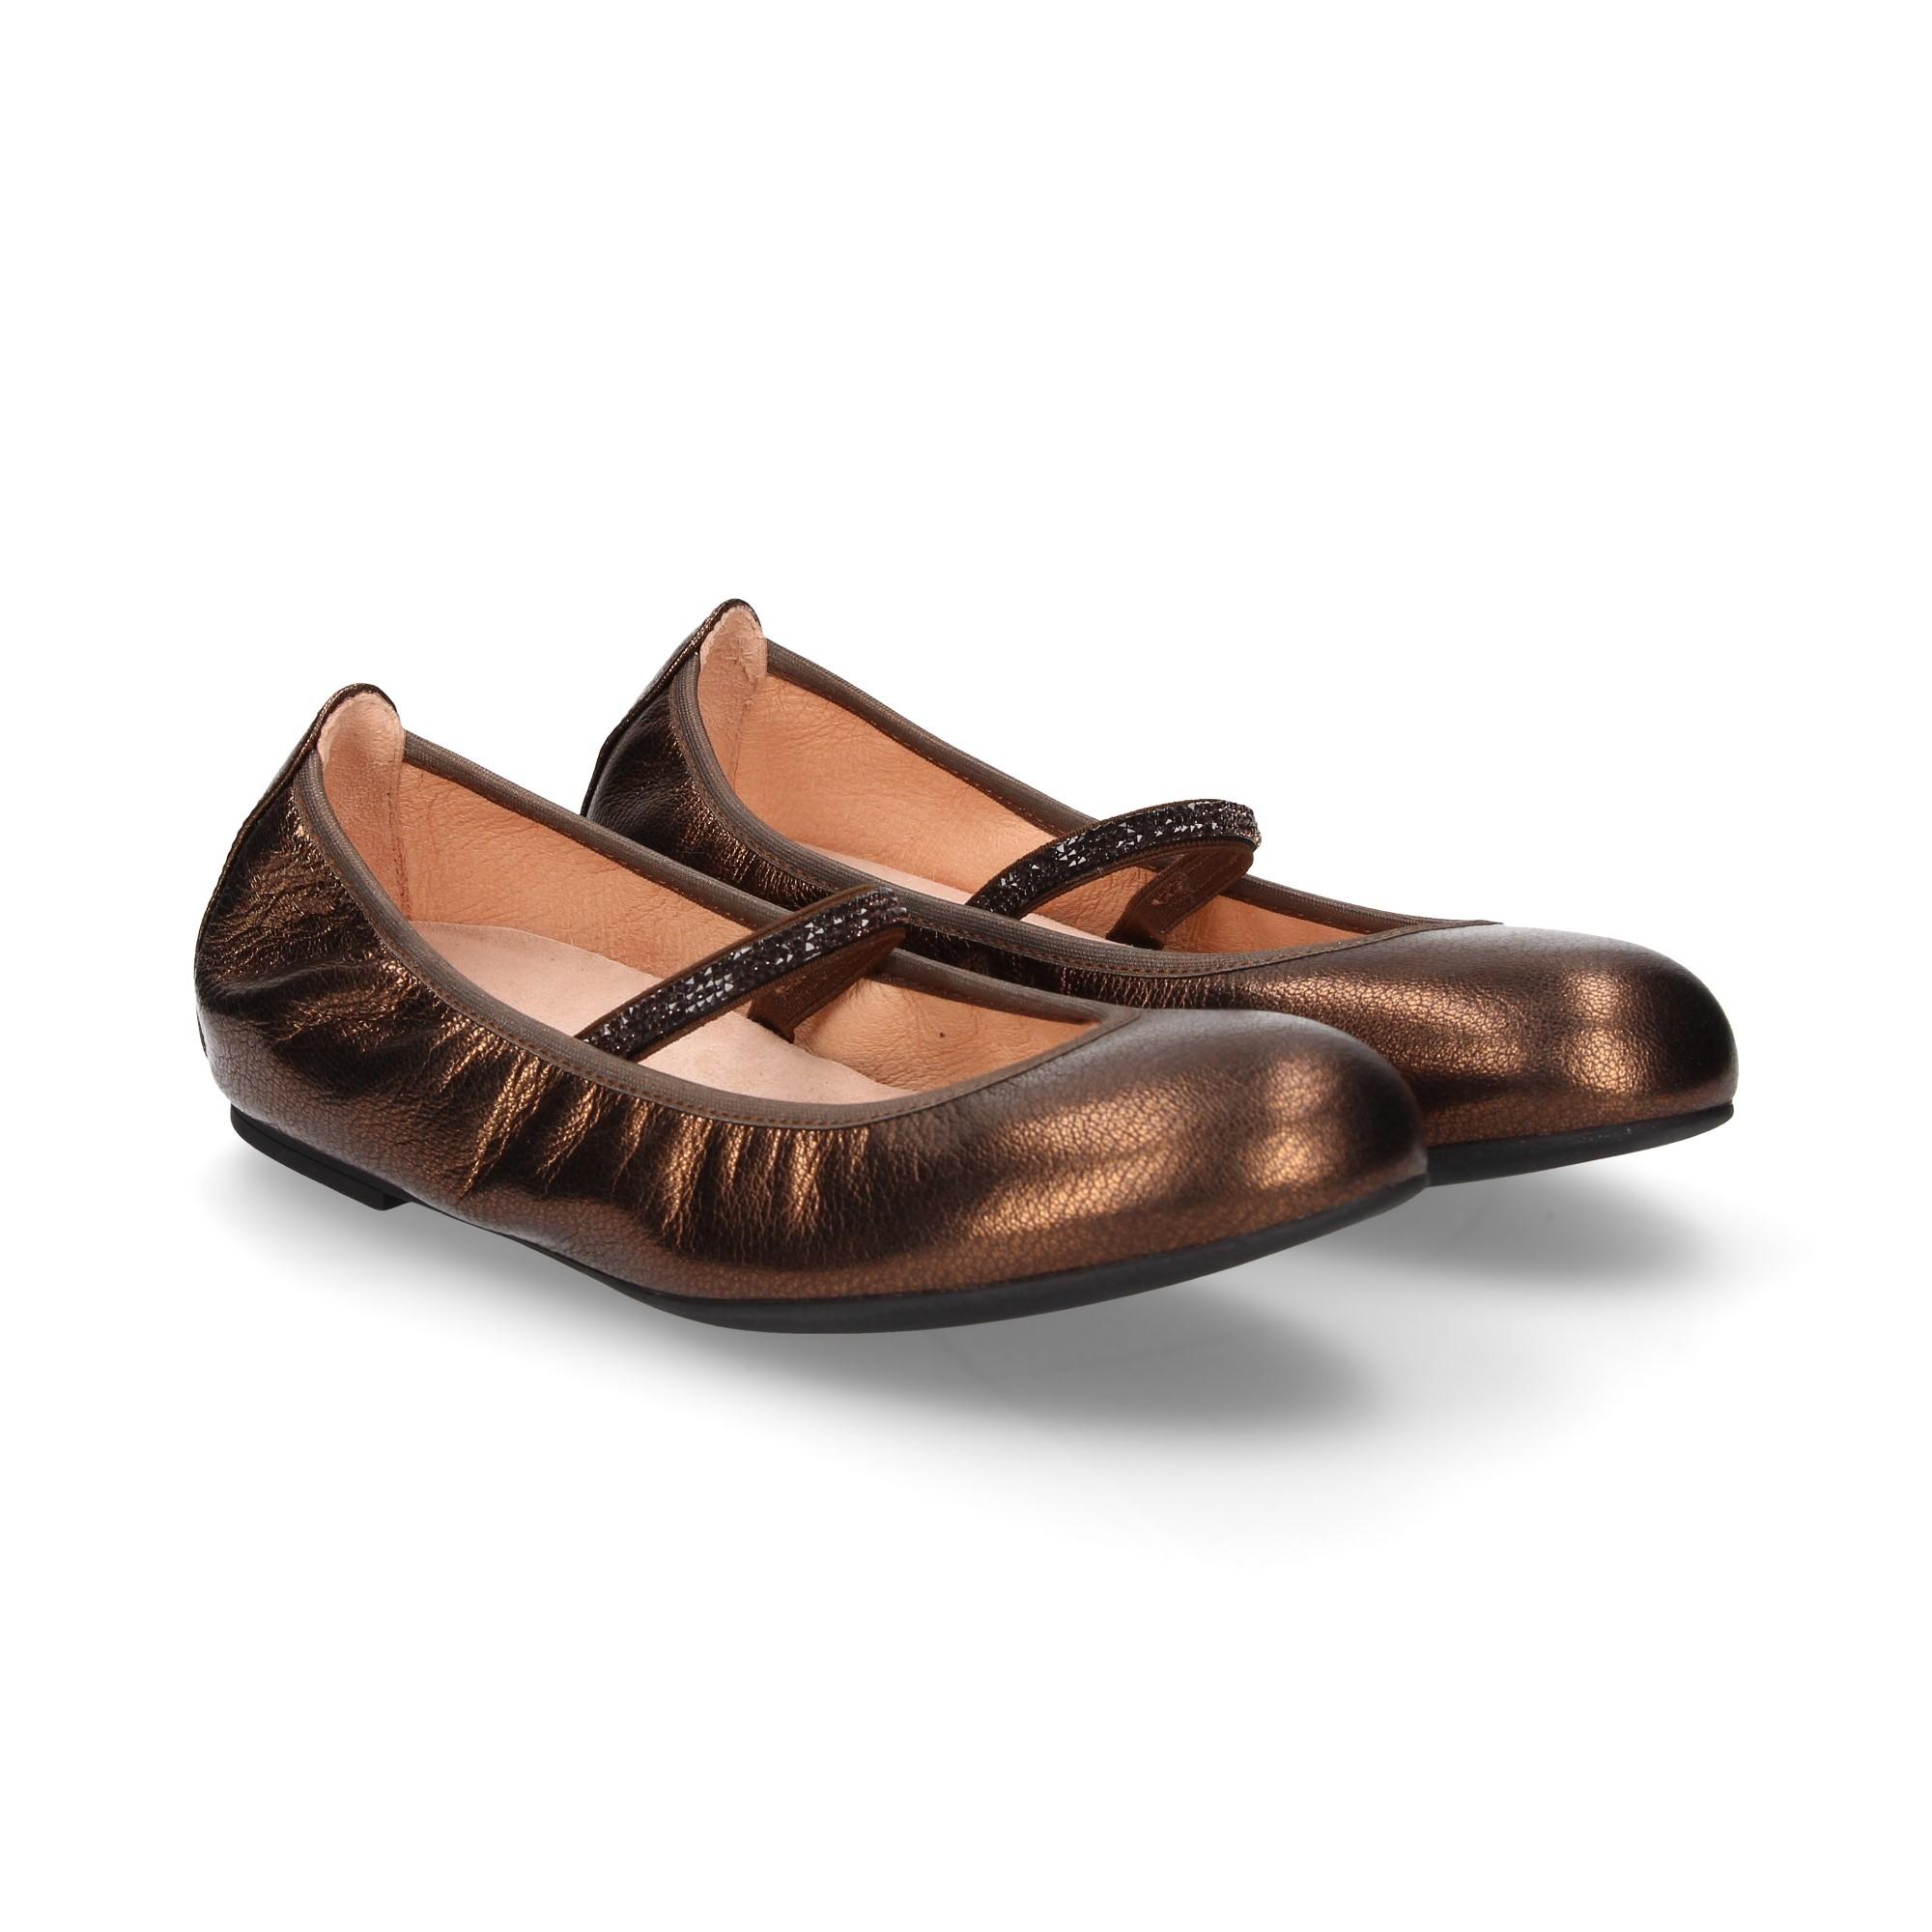 tira-stras-piel-metalizada-cobre